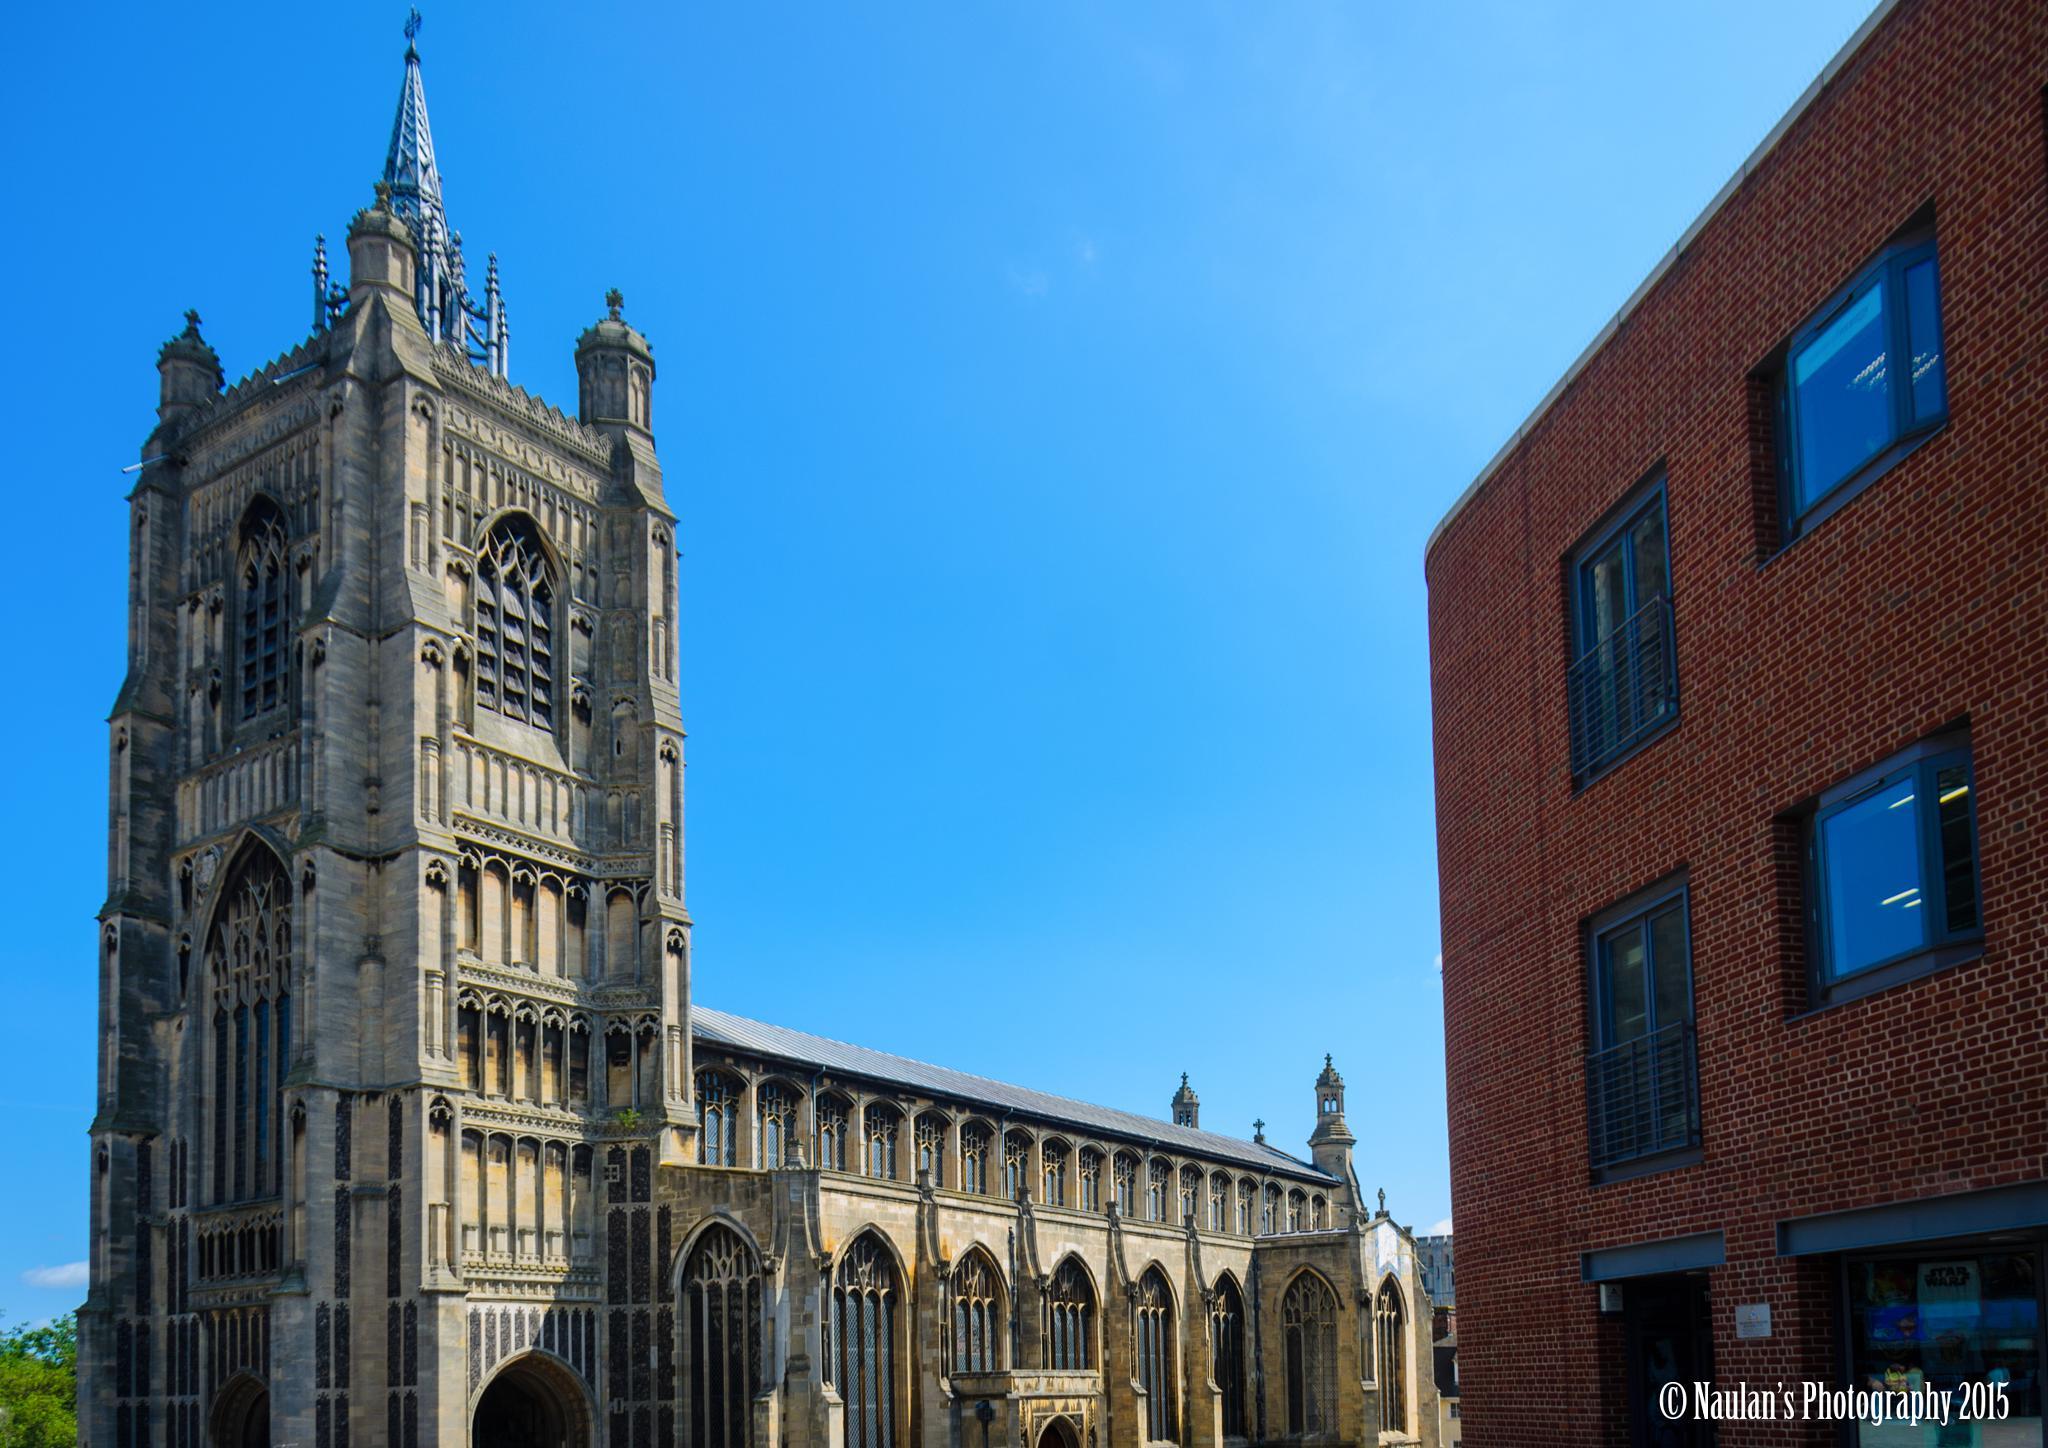 St Peter Mancroft Church by Naulan Charles